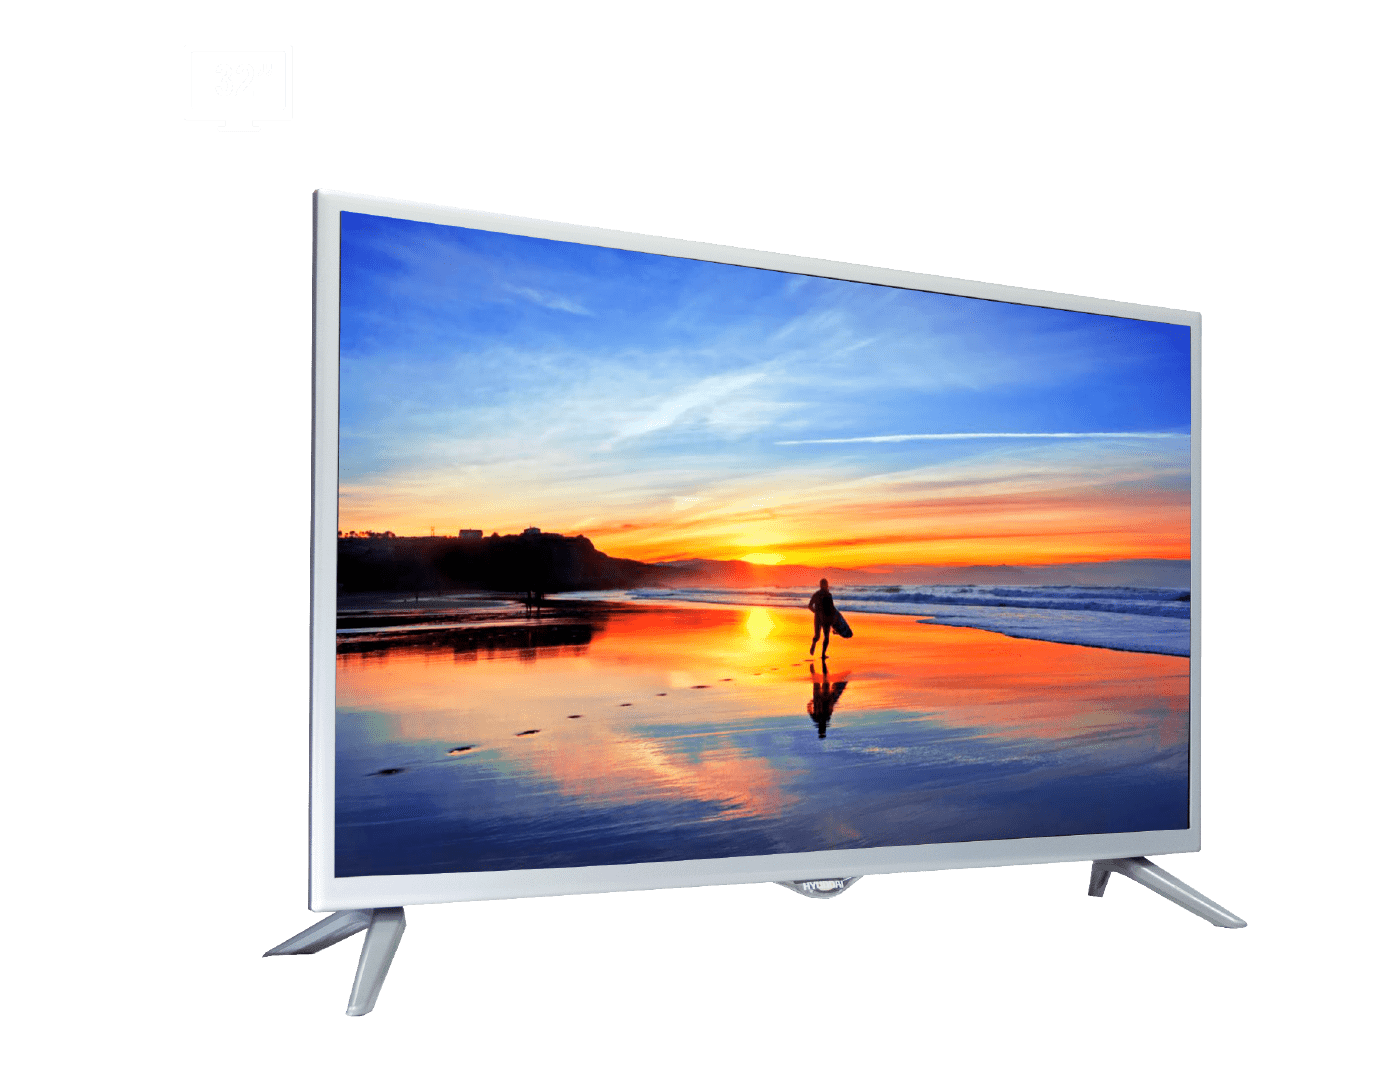 hyundai-smart-tv-catalogo-32-nuevo-min